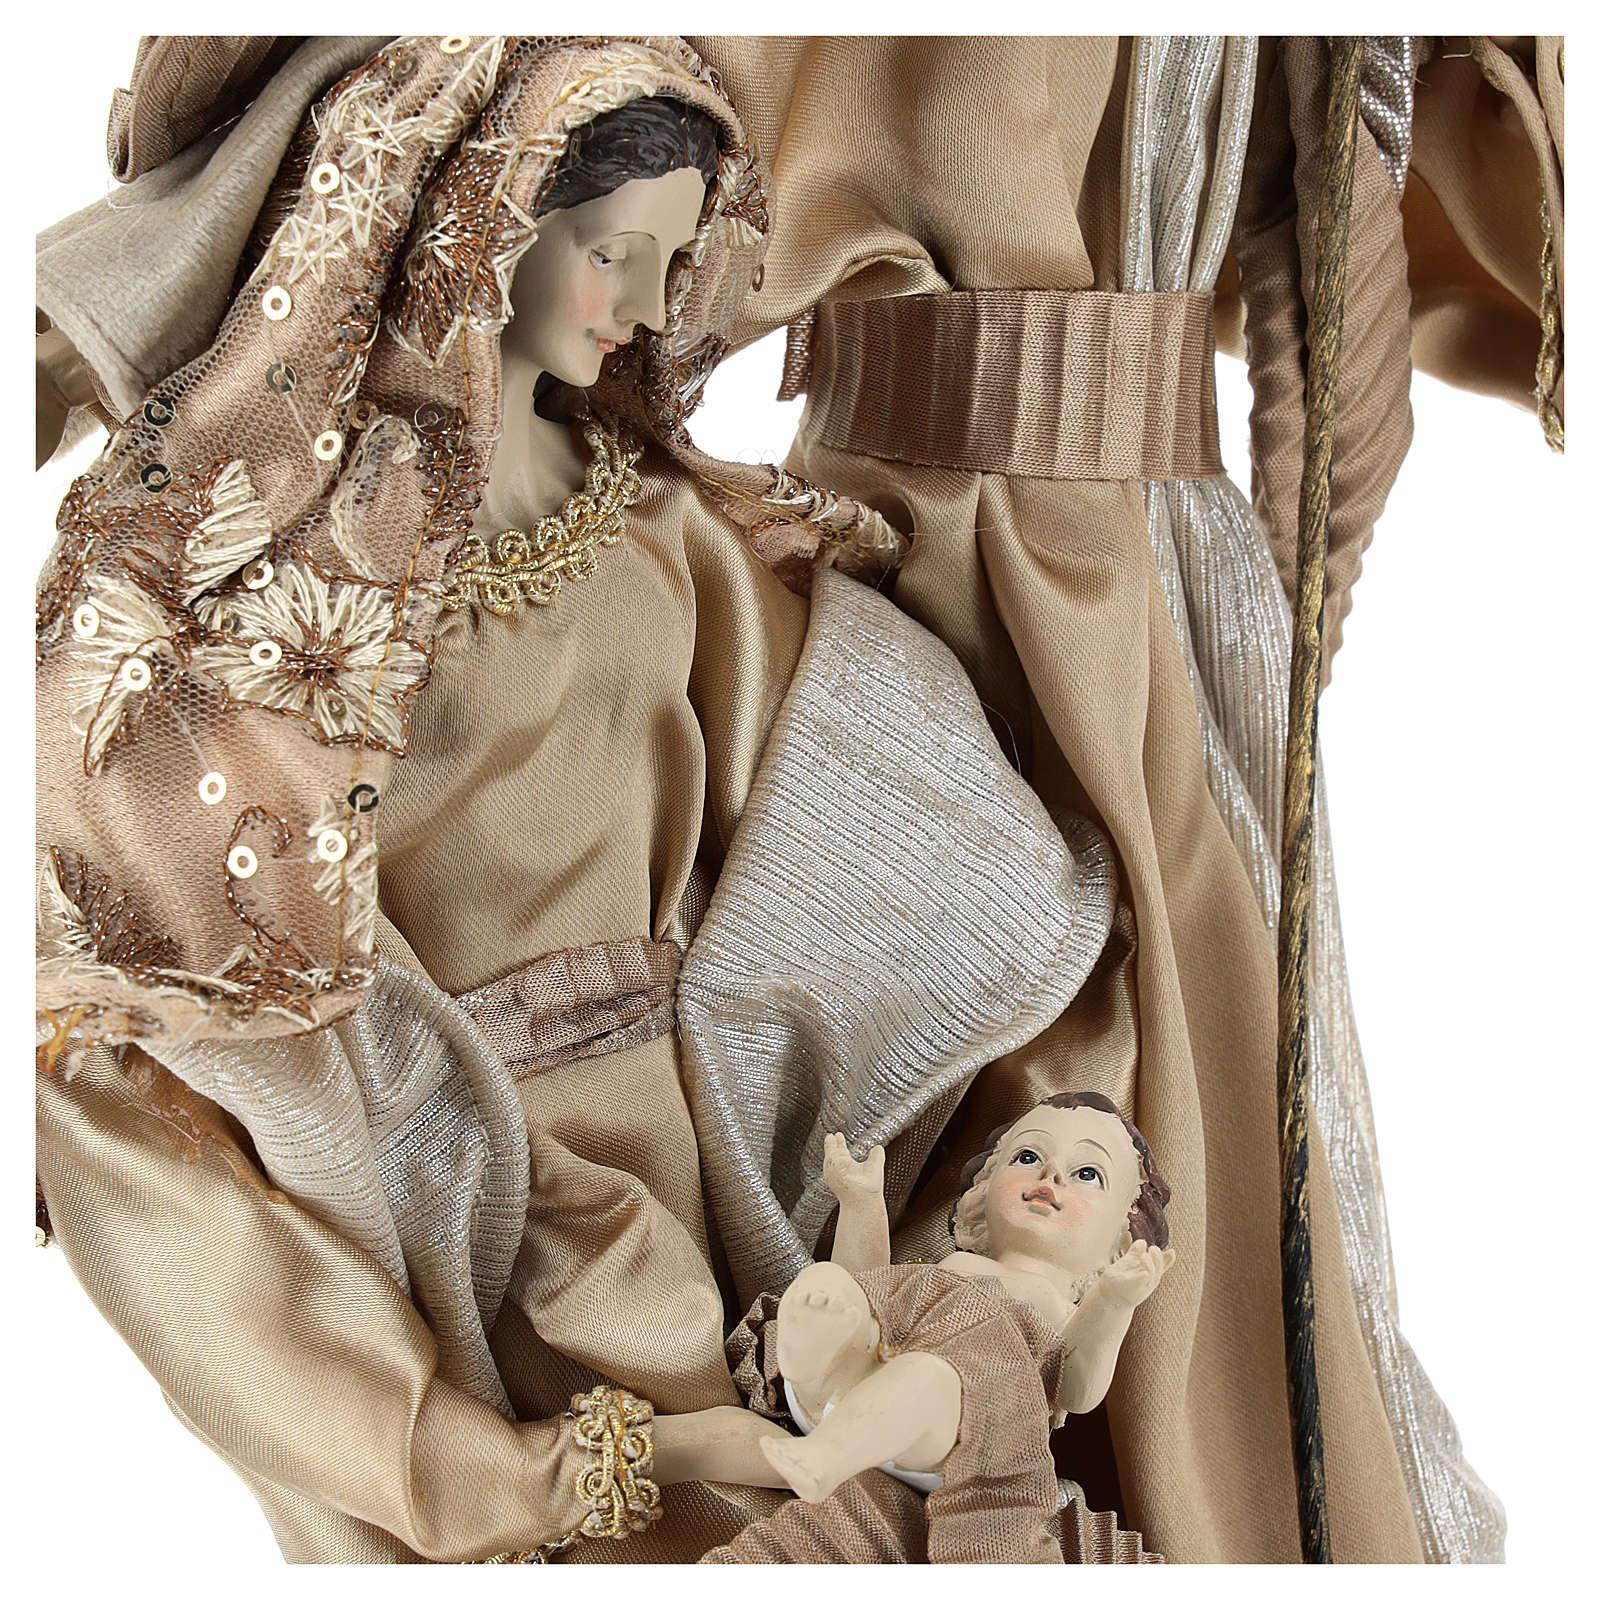 Natividad 31 cm resina y tela Gold 3